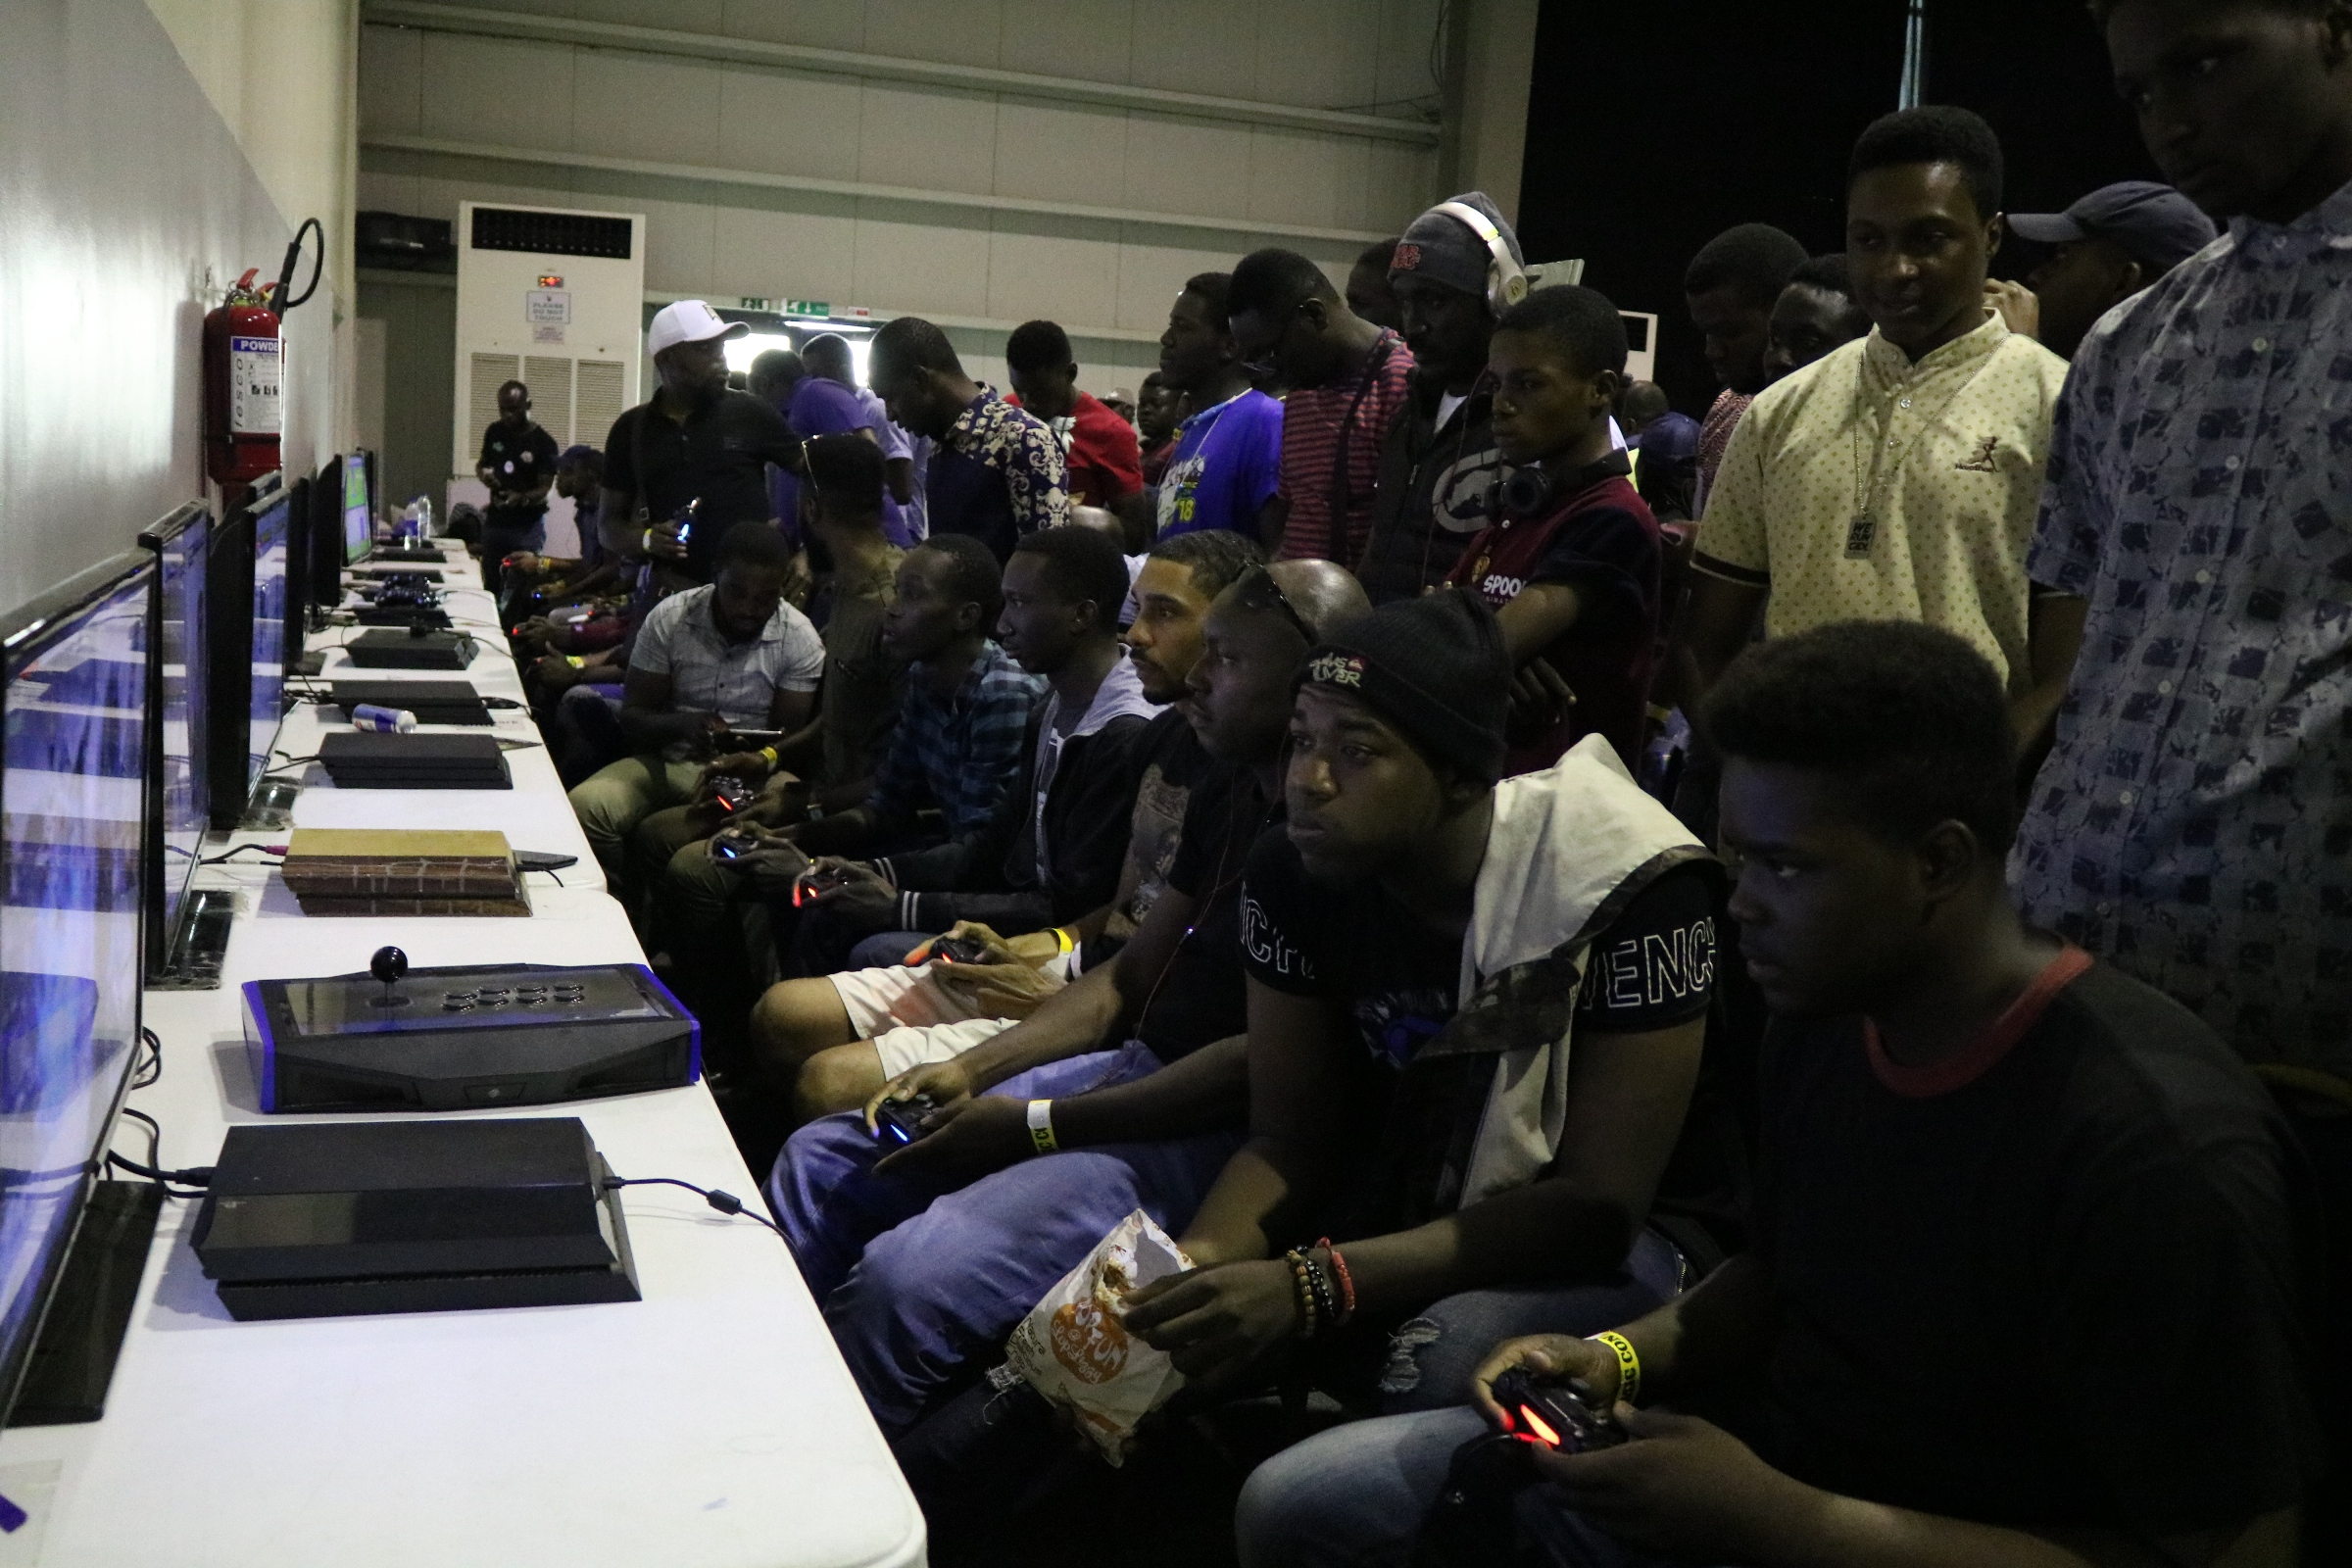 IMG 9529 1 - REVEALED: Full Program Schedule For Lagos Comic Con 2019 + eSports Venue Change